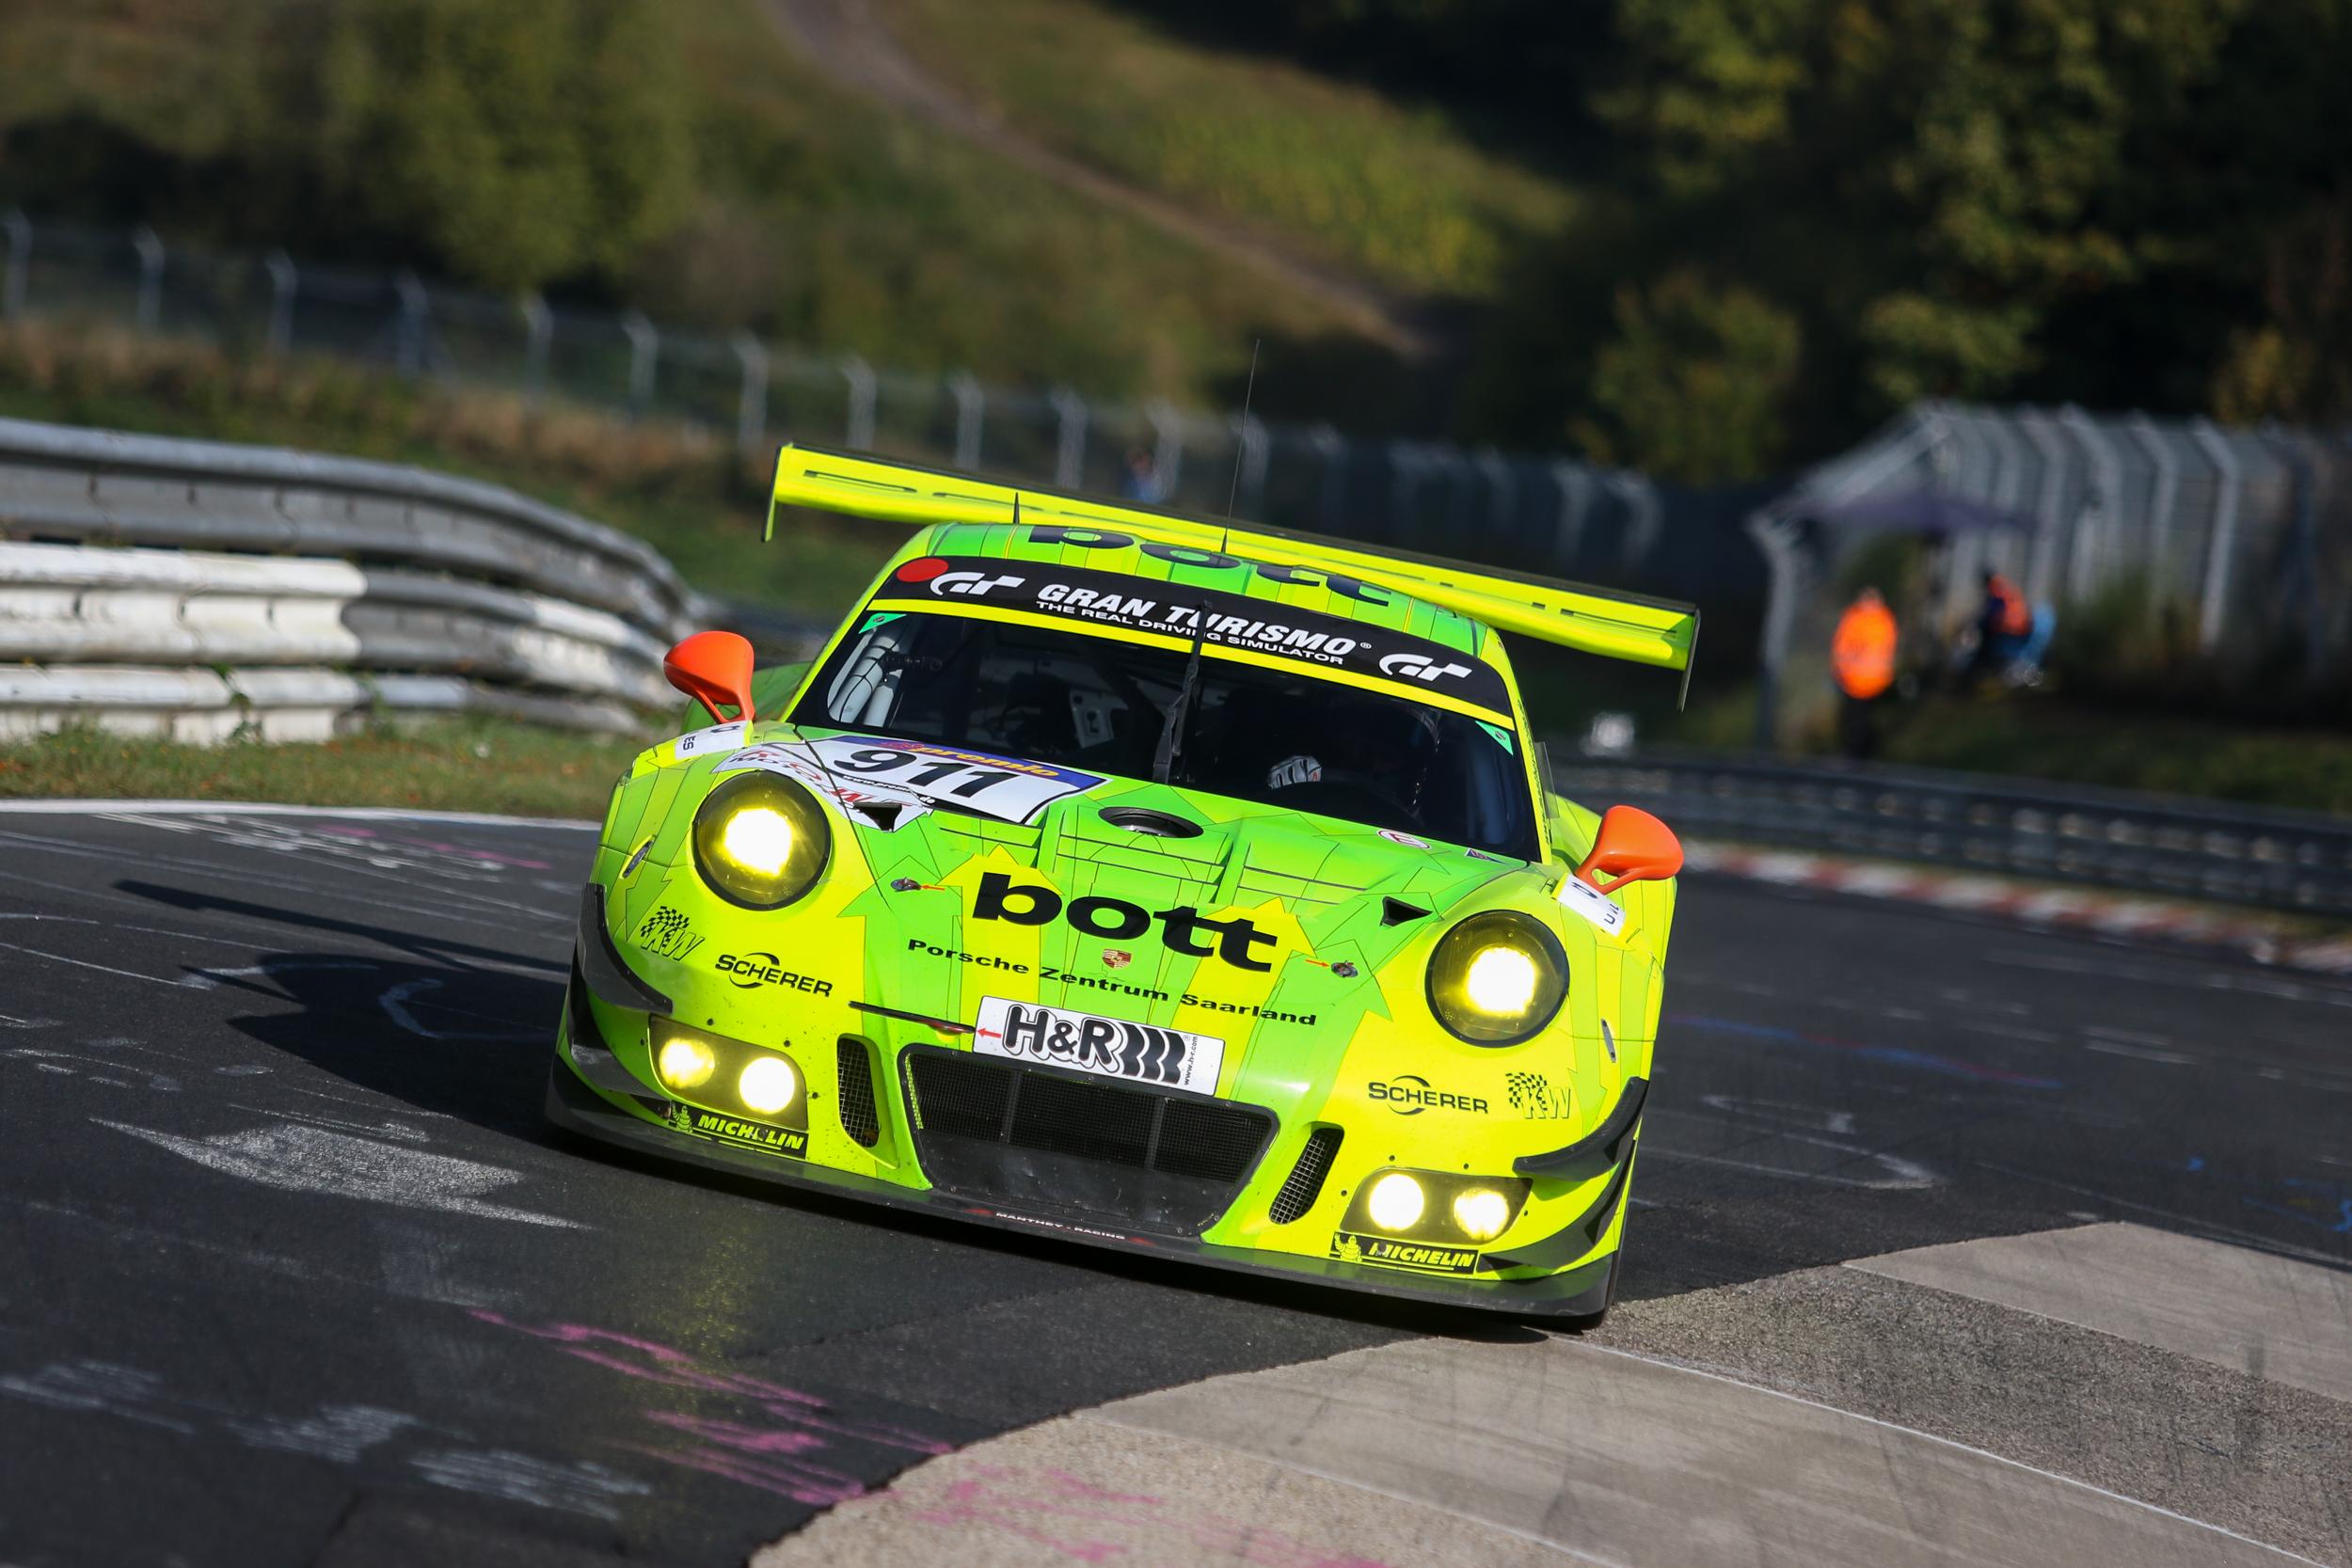 Bathurst Car Racing